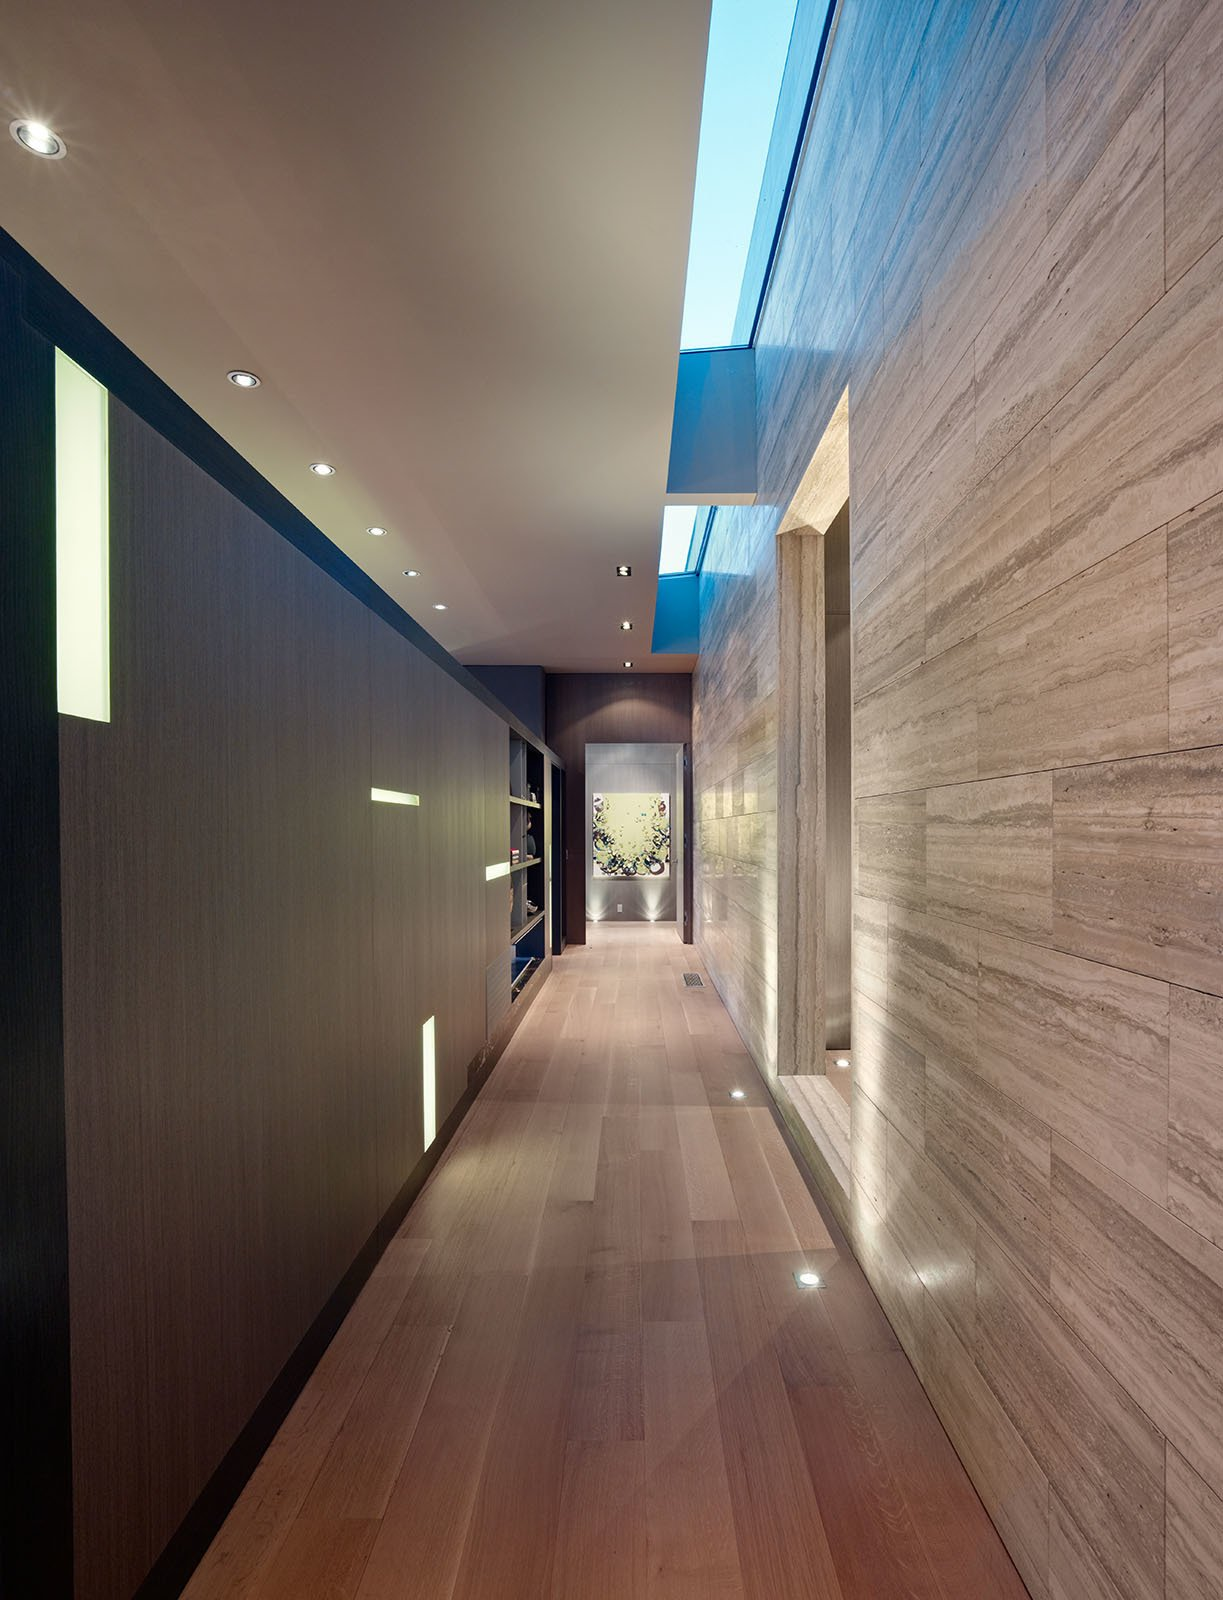 Nightingale Residence by Studio Pali Fekete architects